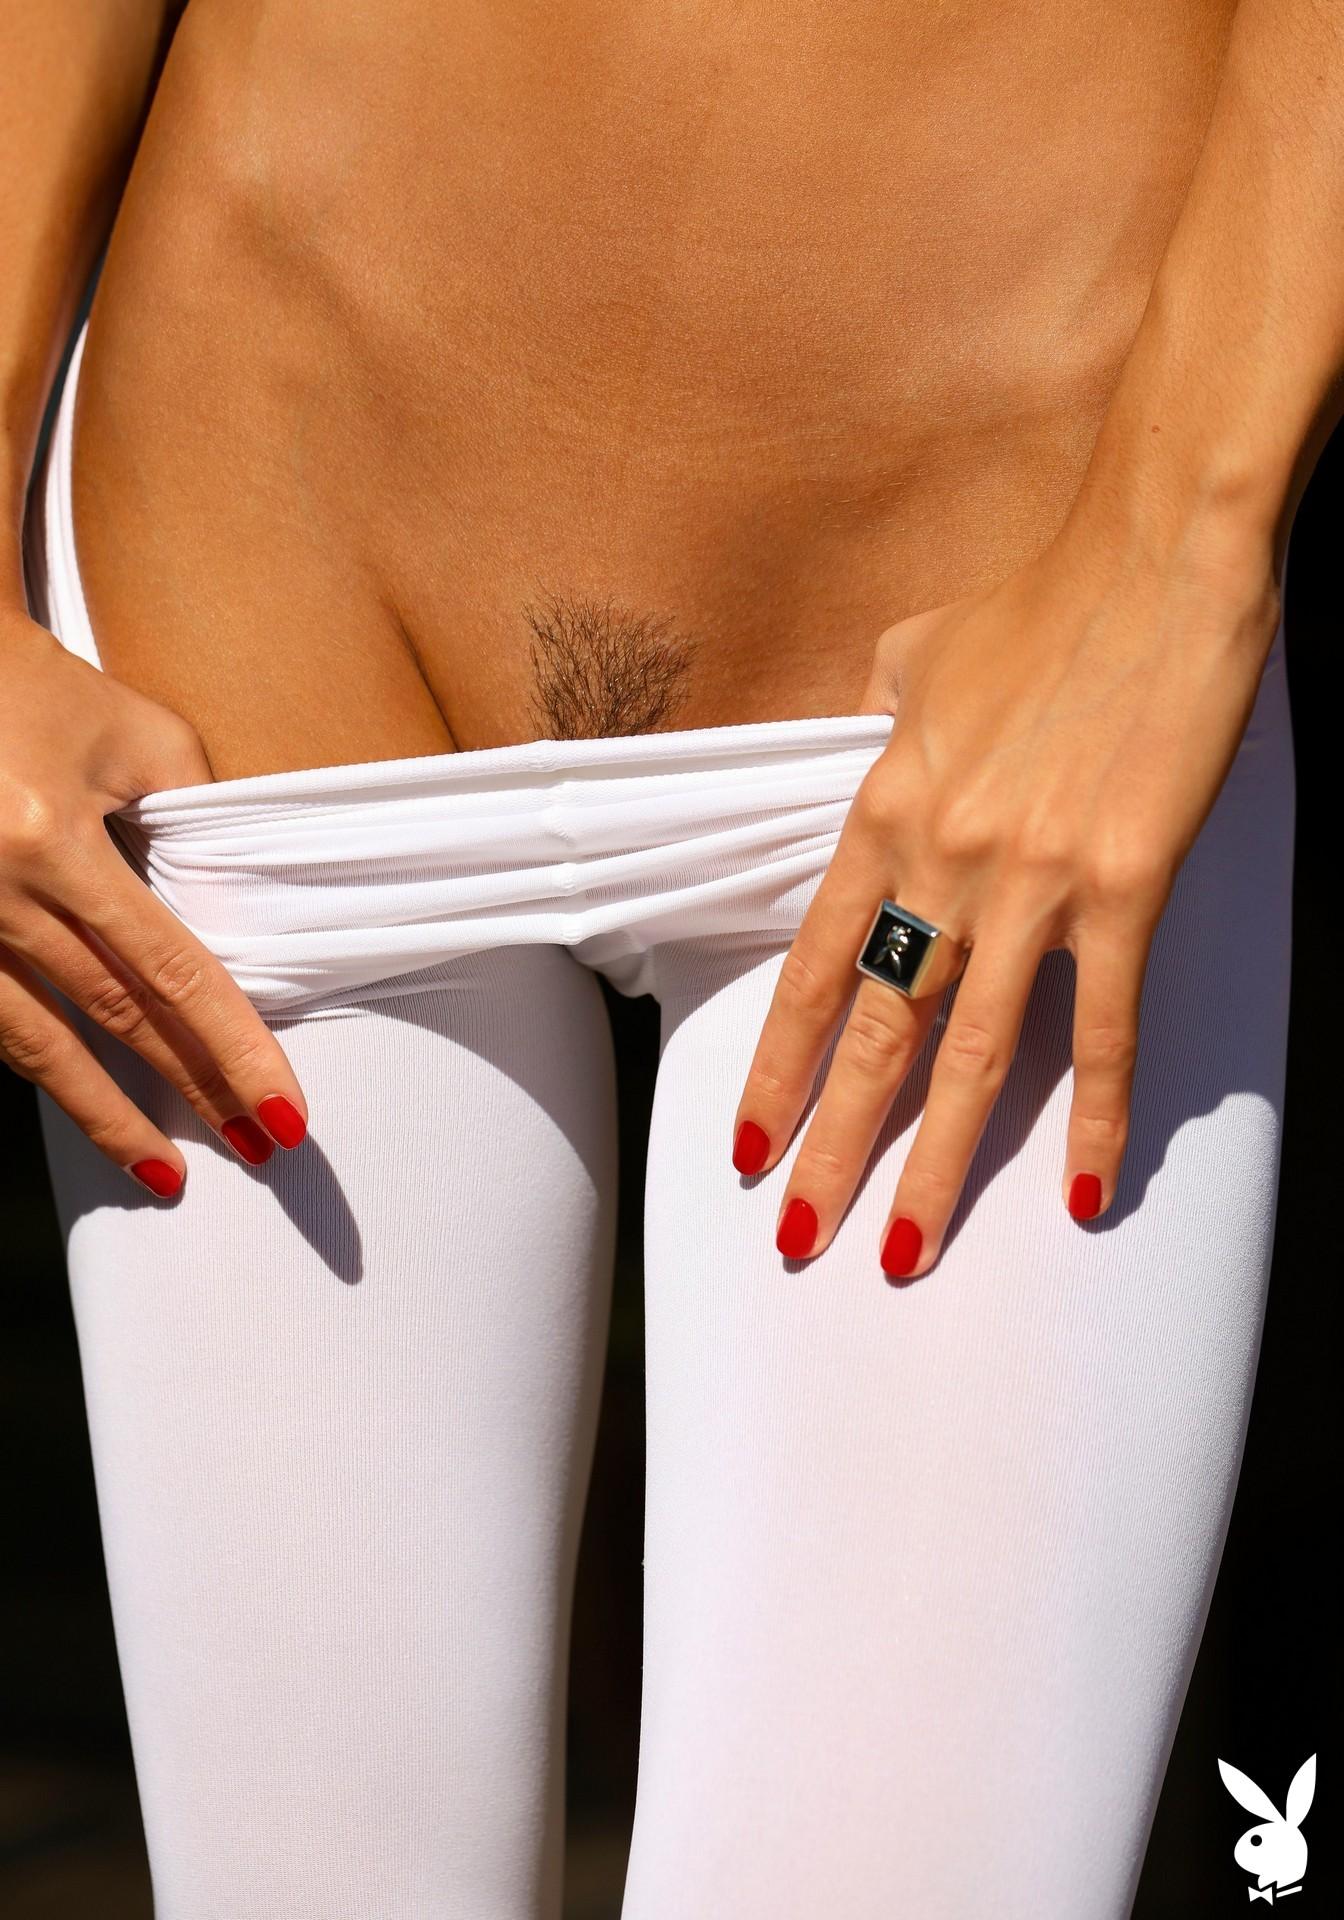 Cledia Fortin For Playboy International Playboy Plus (19)